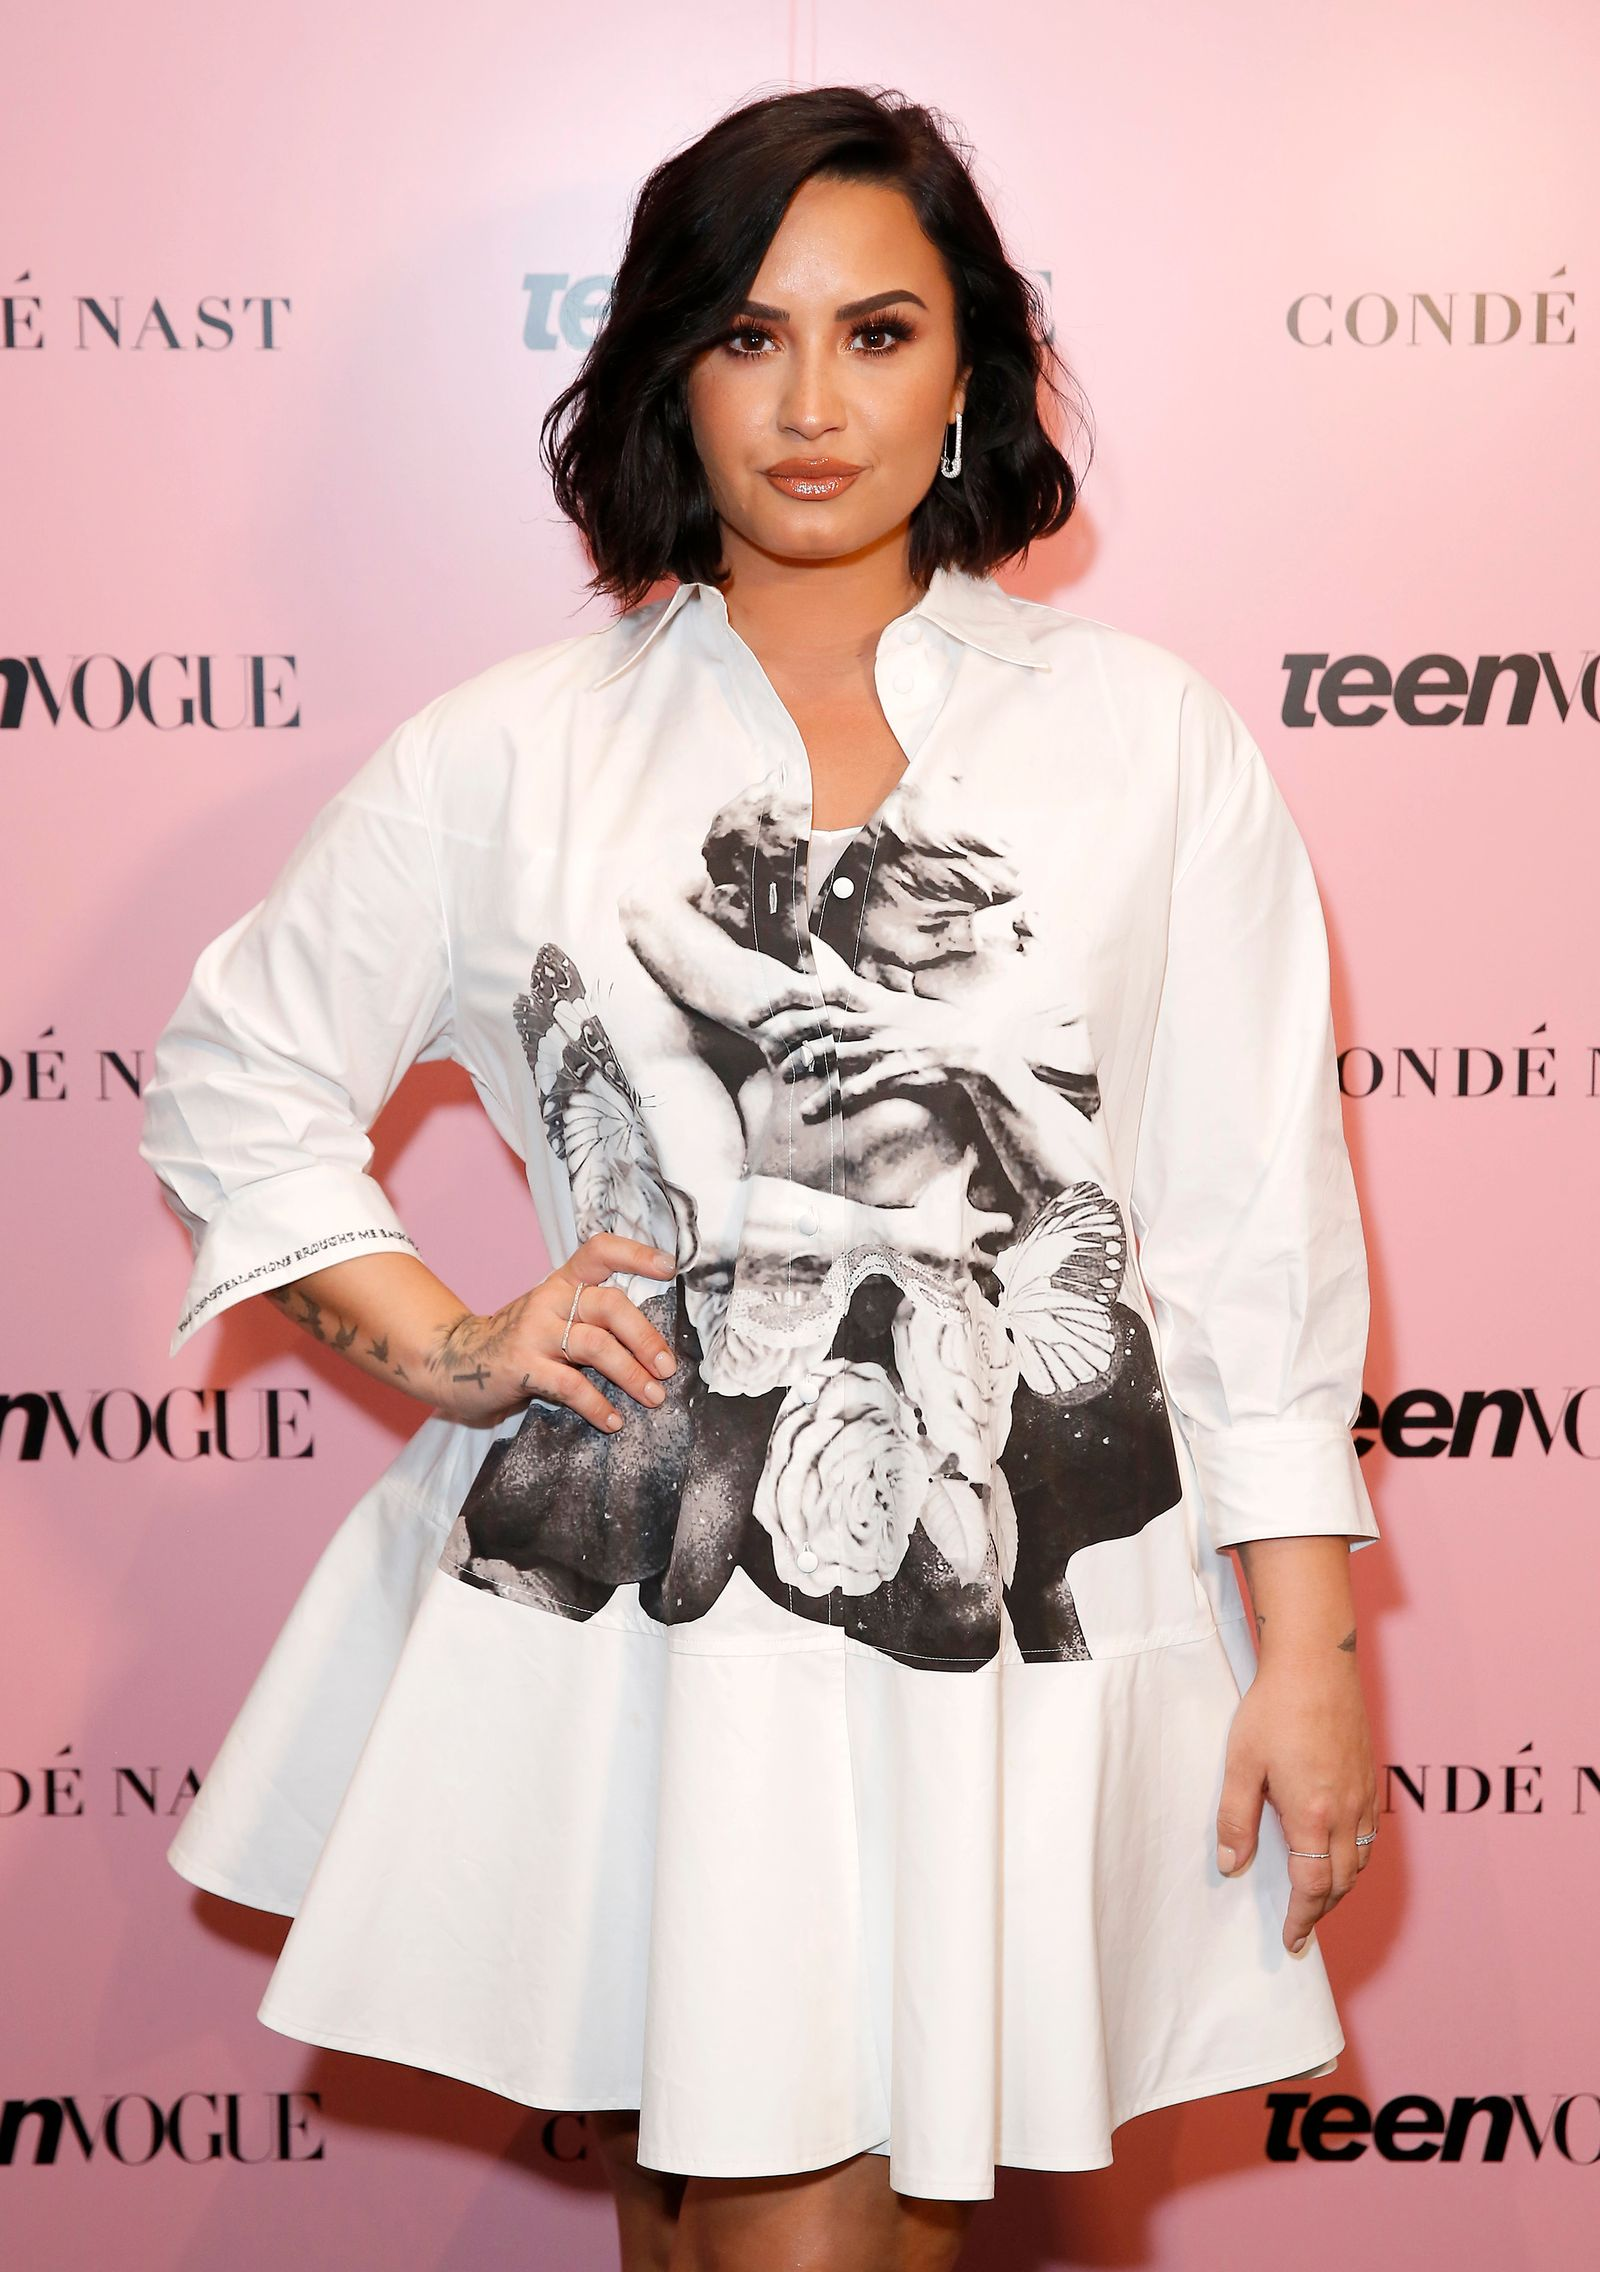 The Teen Vogue Summit 2019: Arrivals